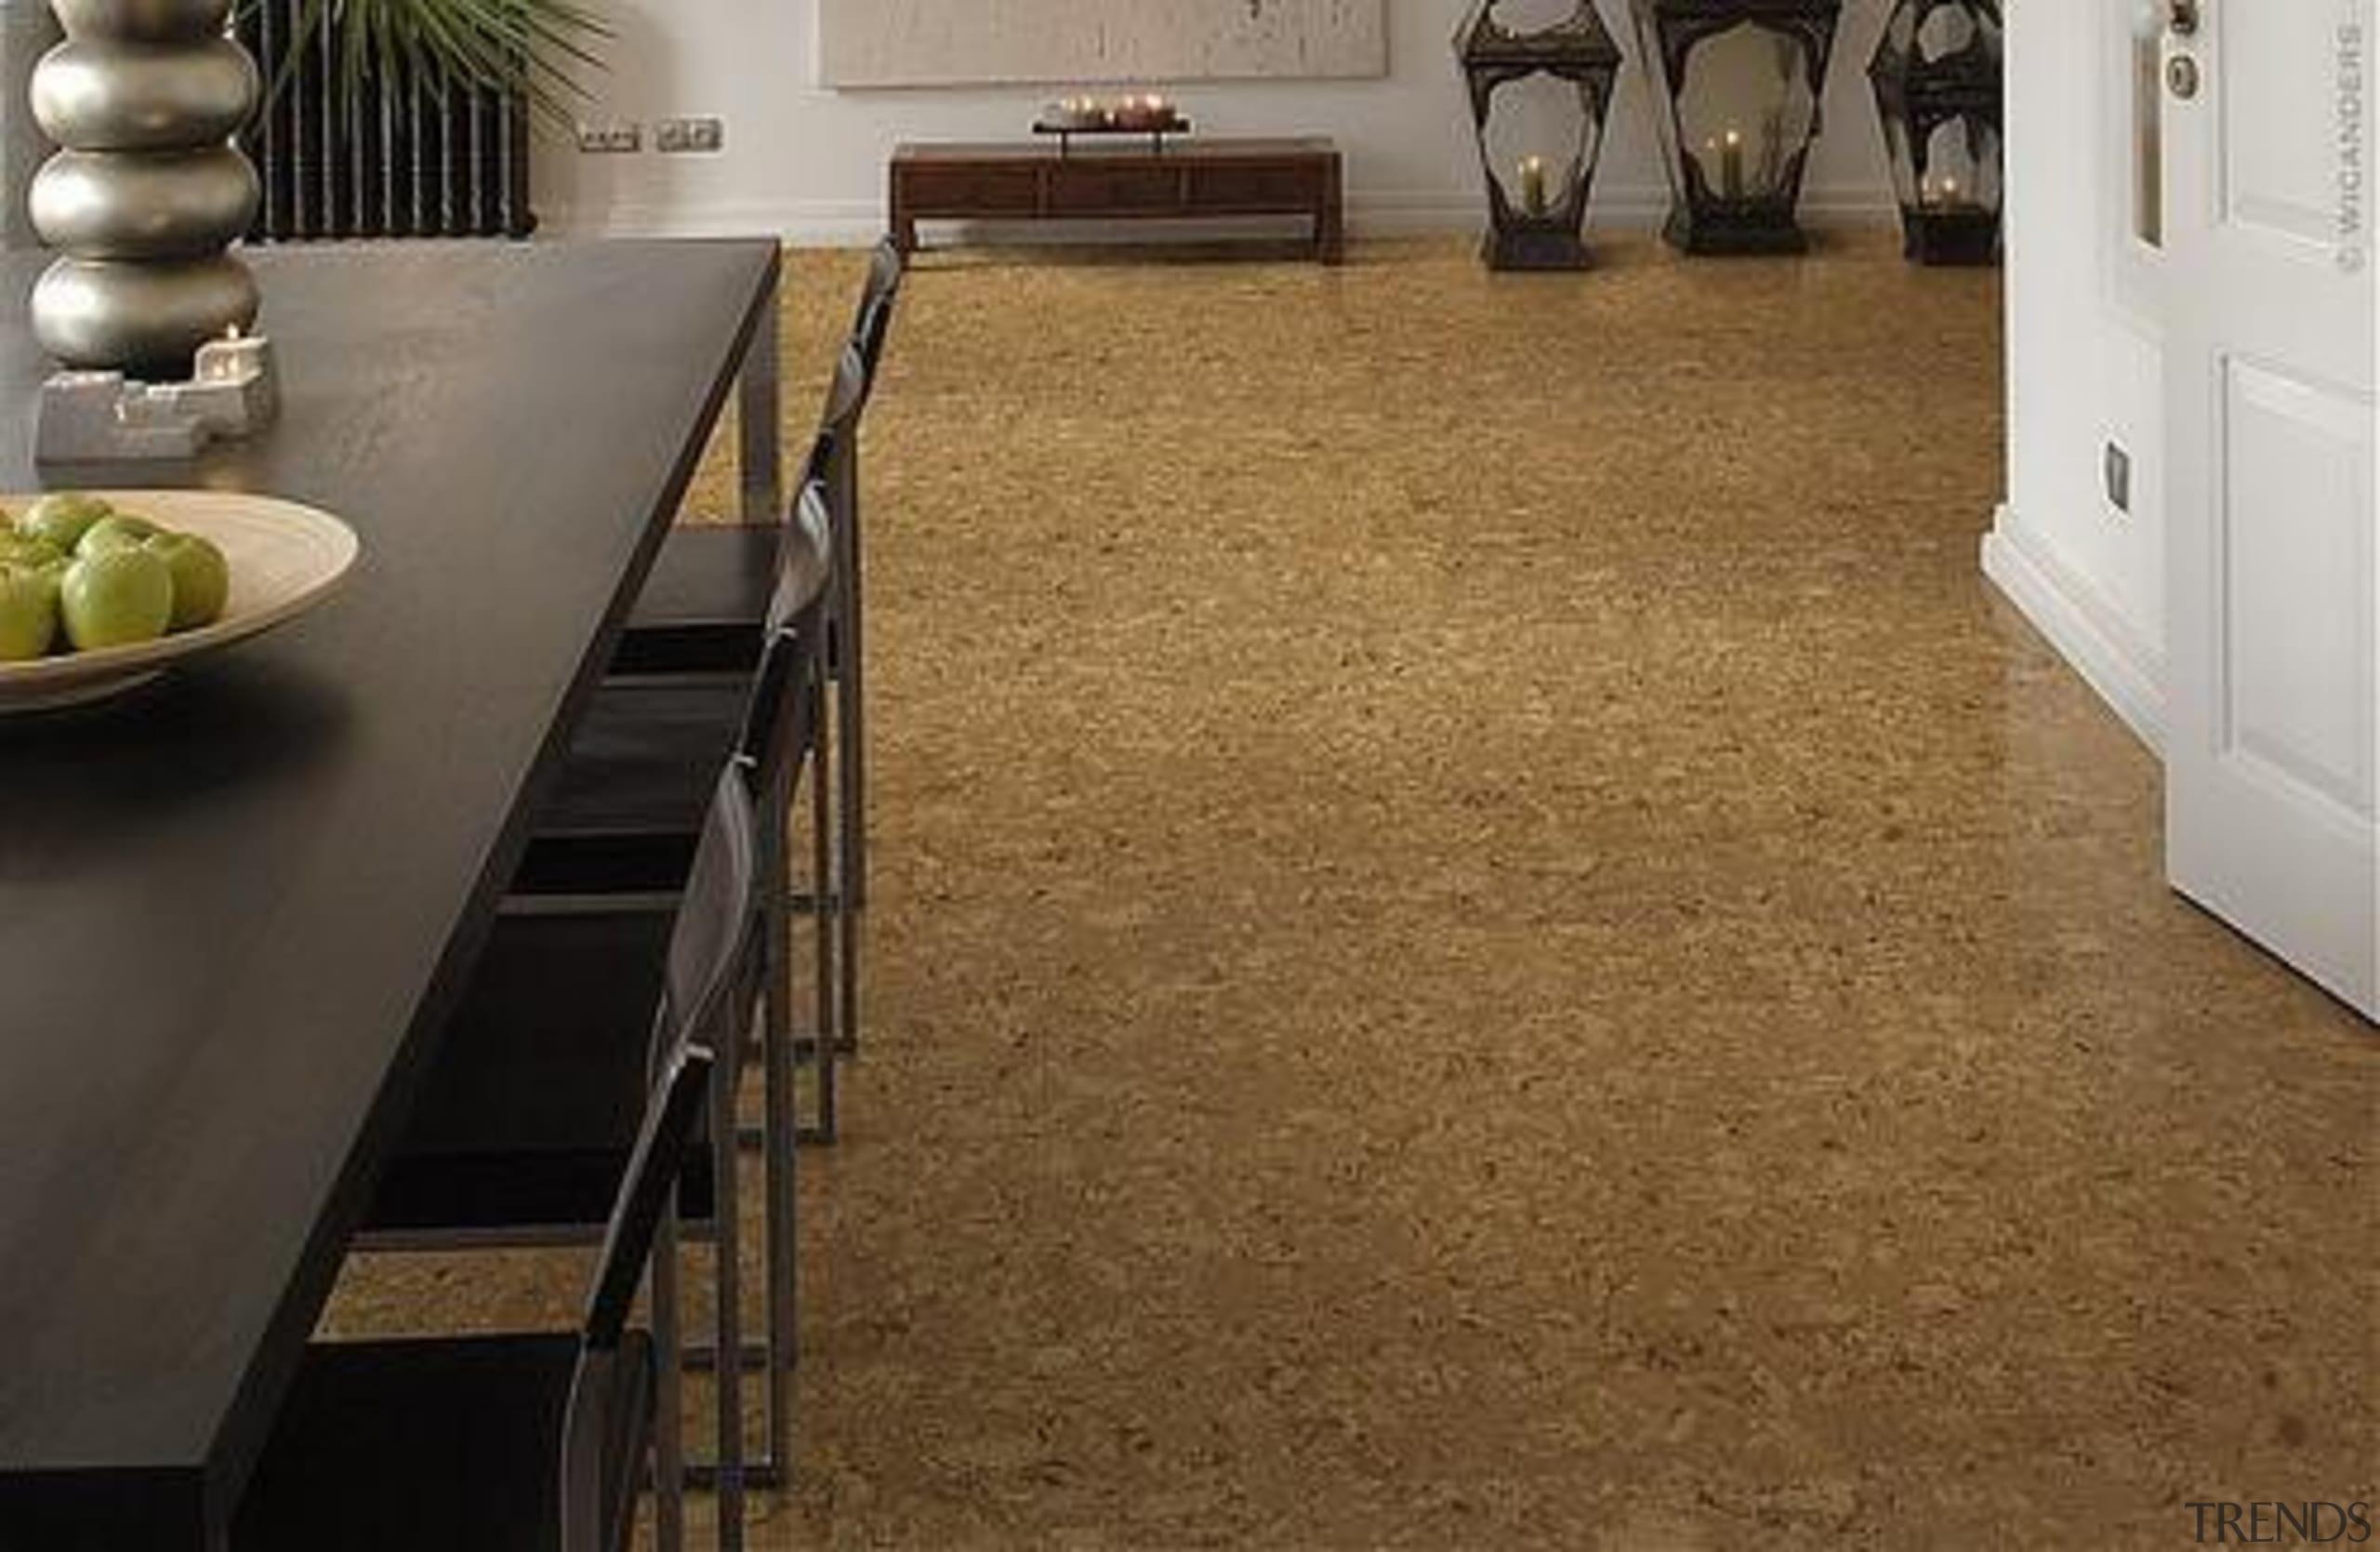 Cork Comfort Original Harmony - Cork Comfort Original countertop, floor, flooring, hardwood, interior design, laminate flooring, tile, wood, wood flooring, brown